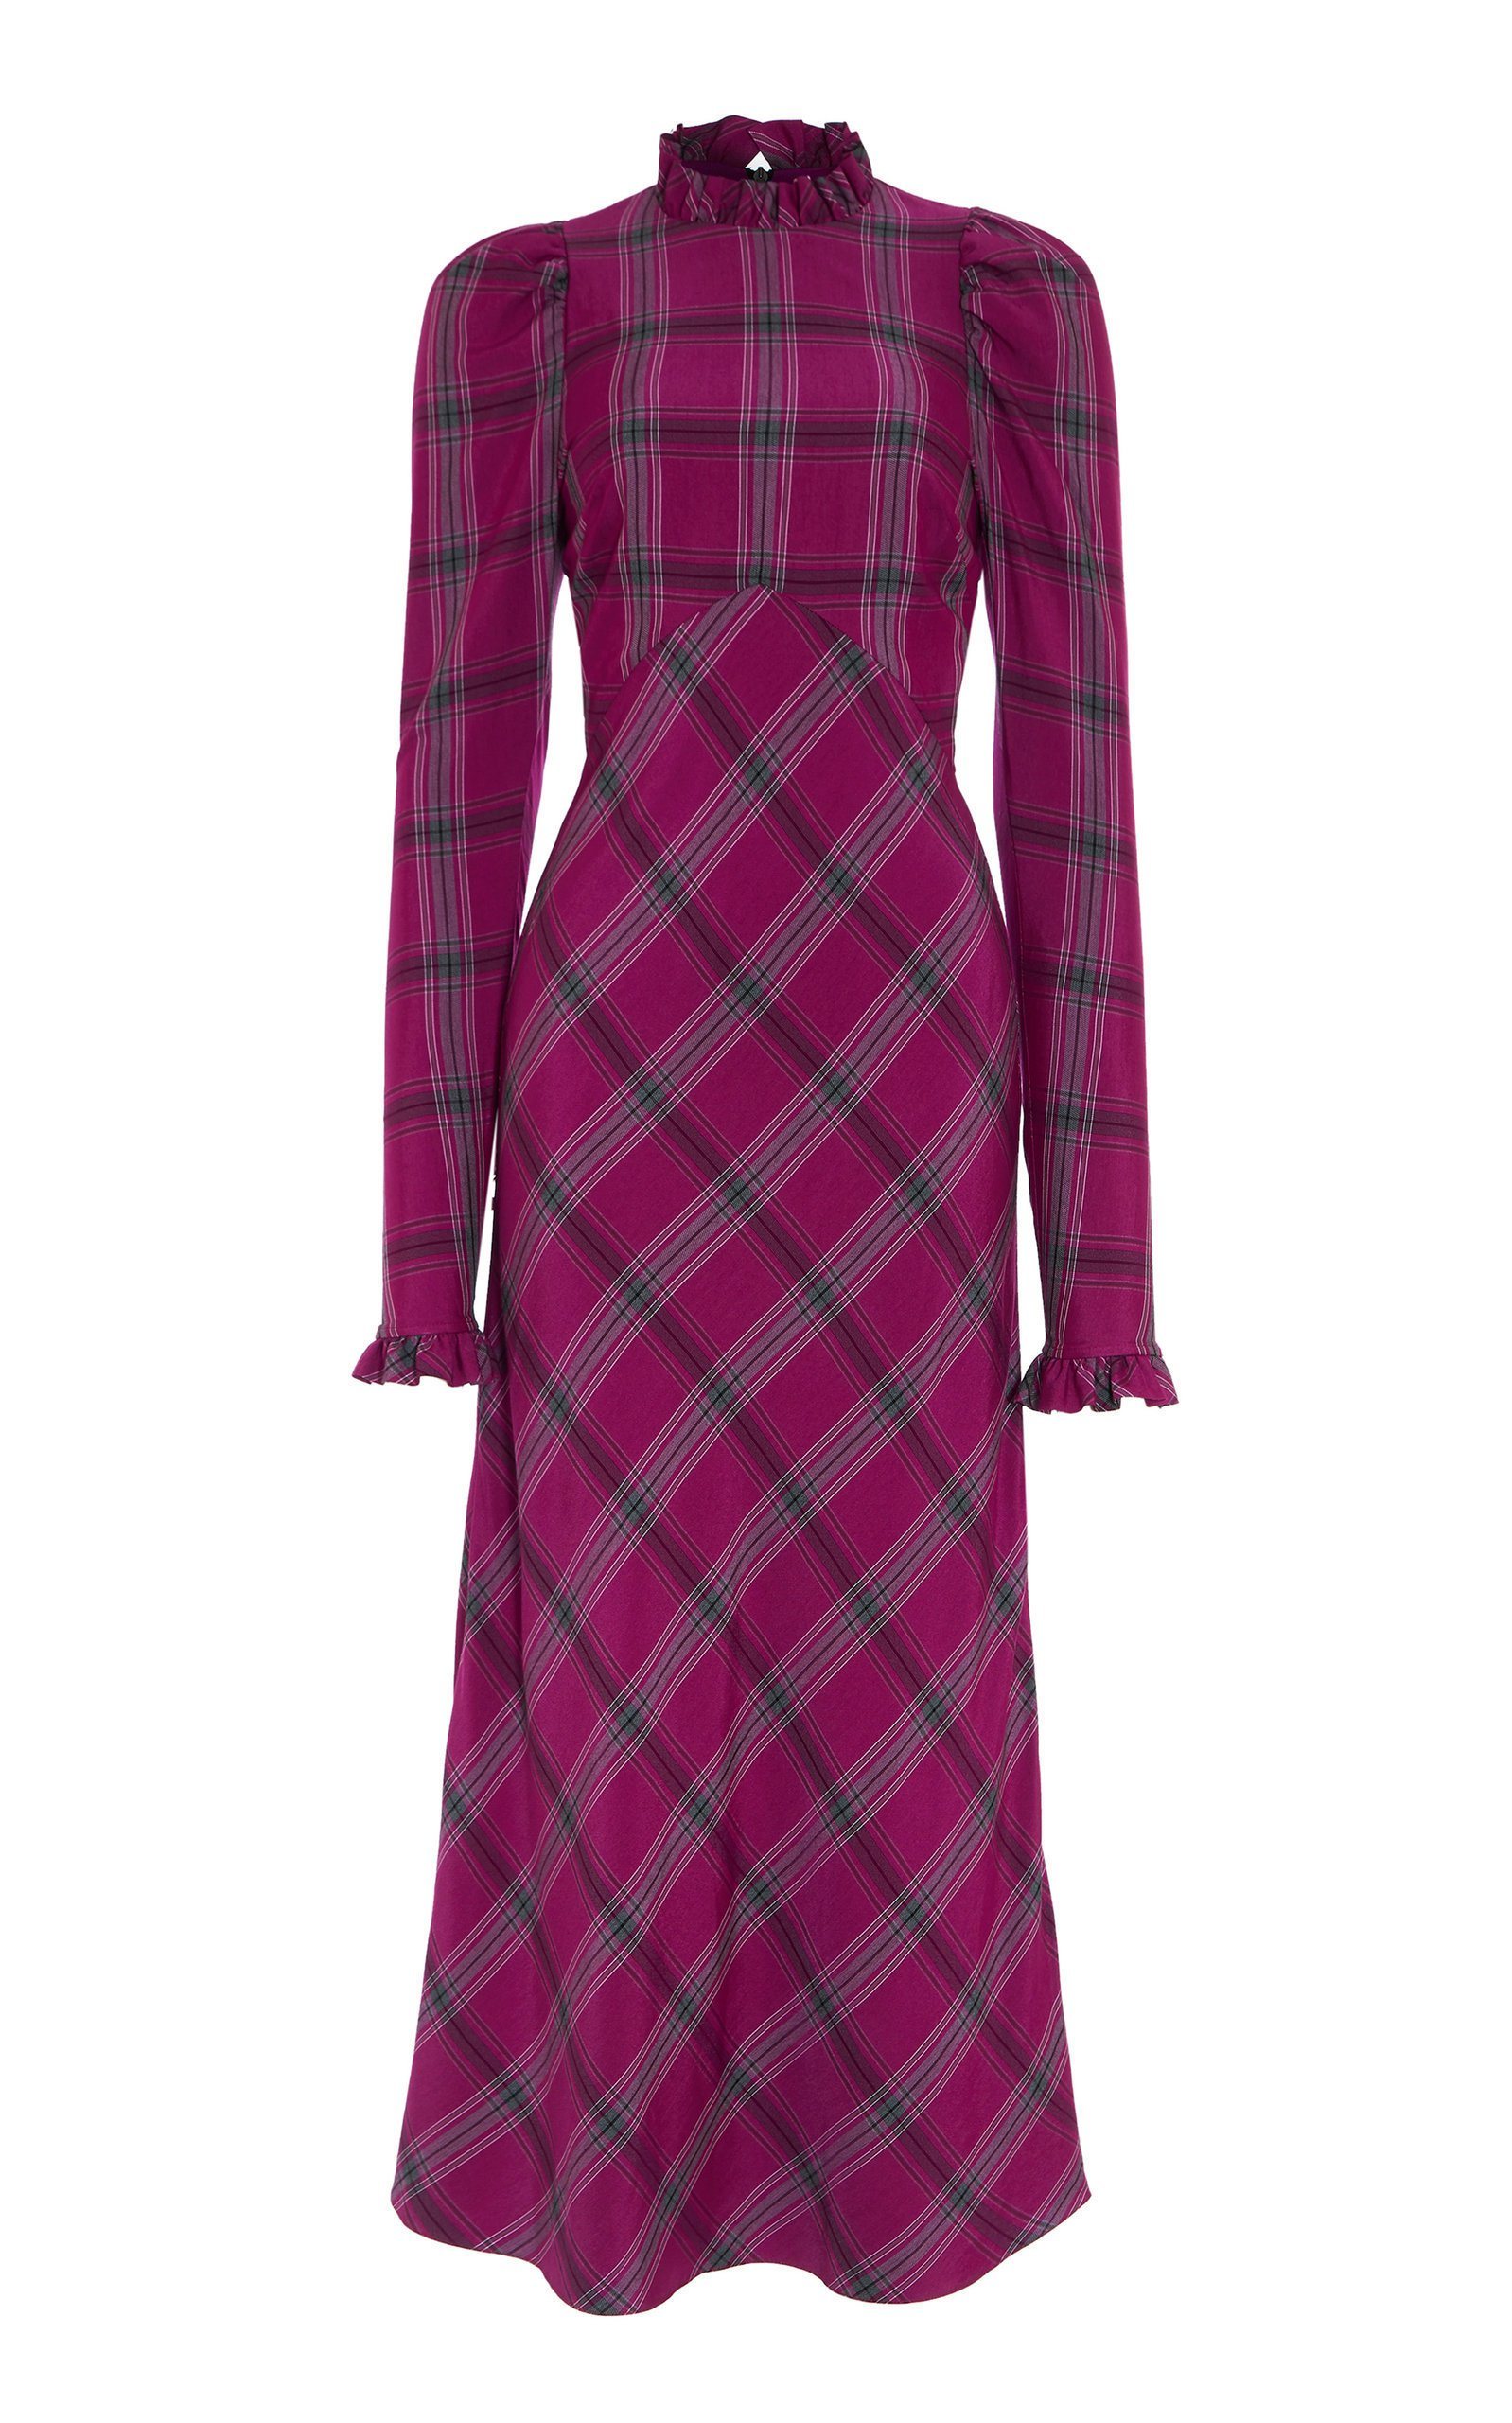 Temperley London Isobel Check Dress